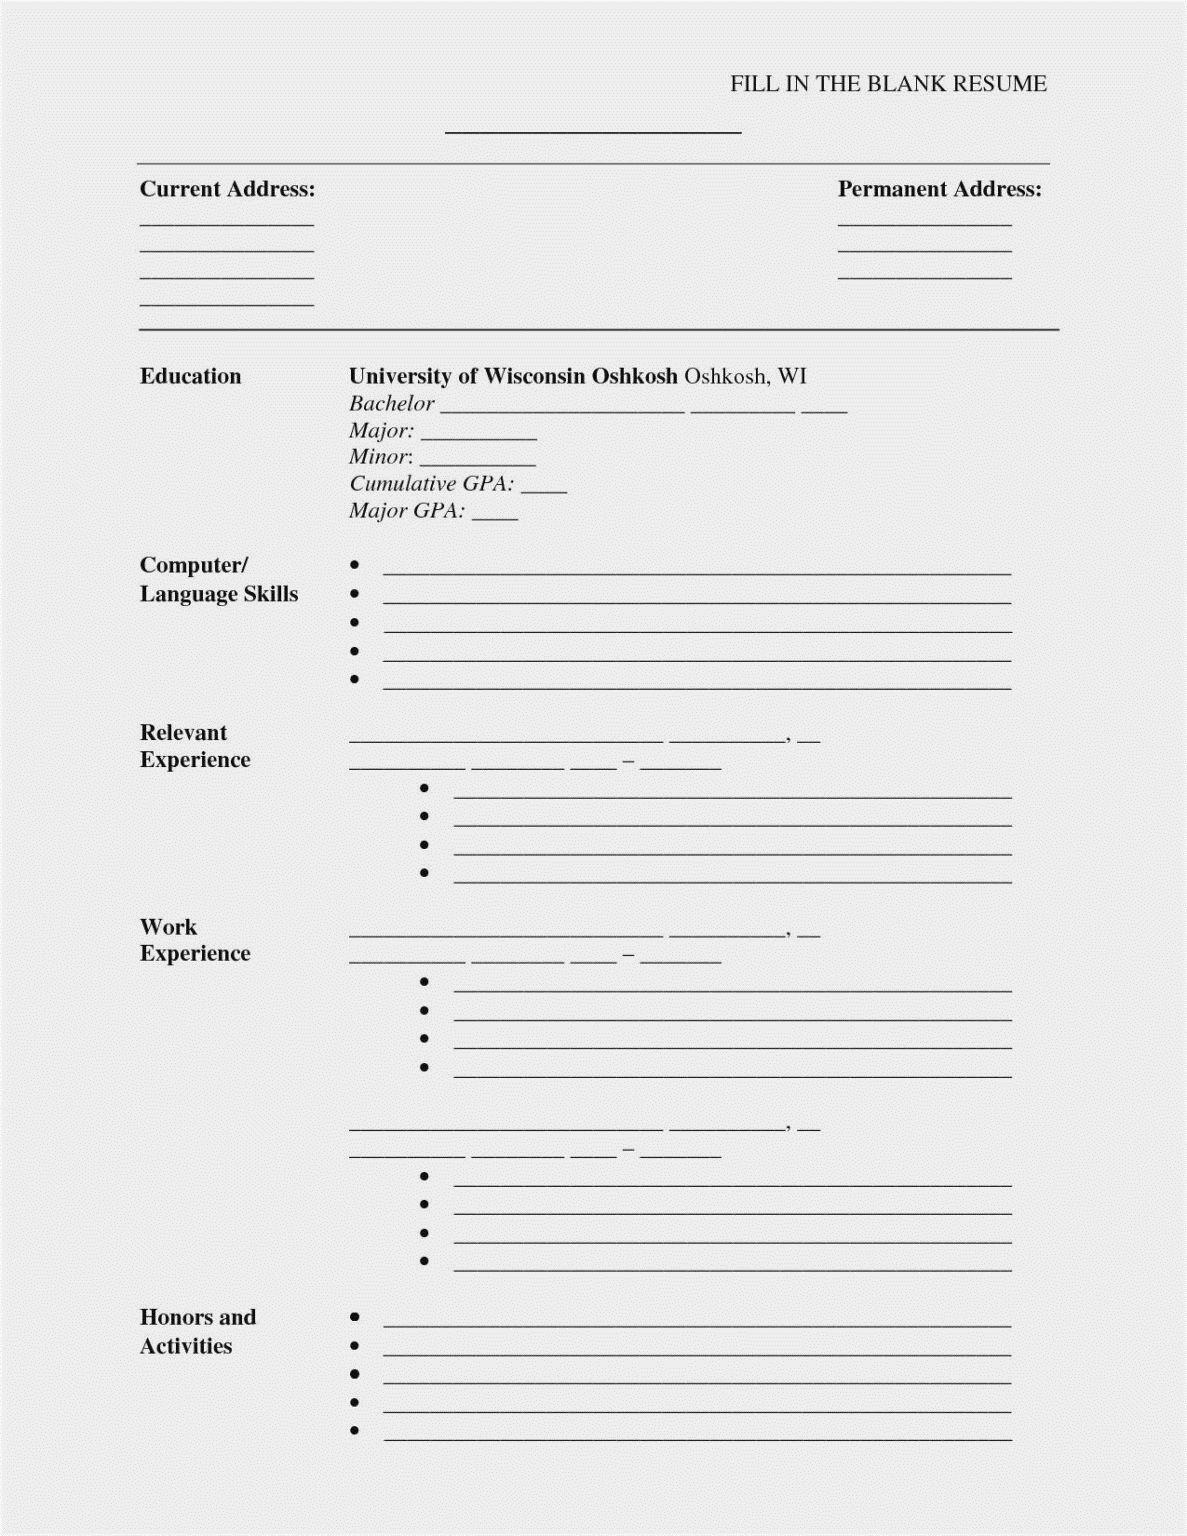 002 Impressive Free Printable Resume Template Blank Inspiration  FillFull